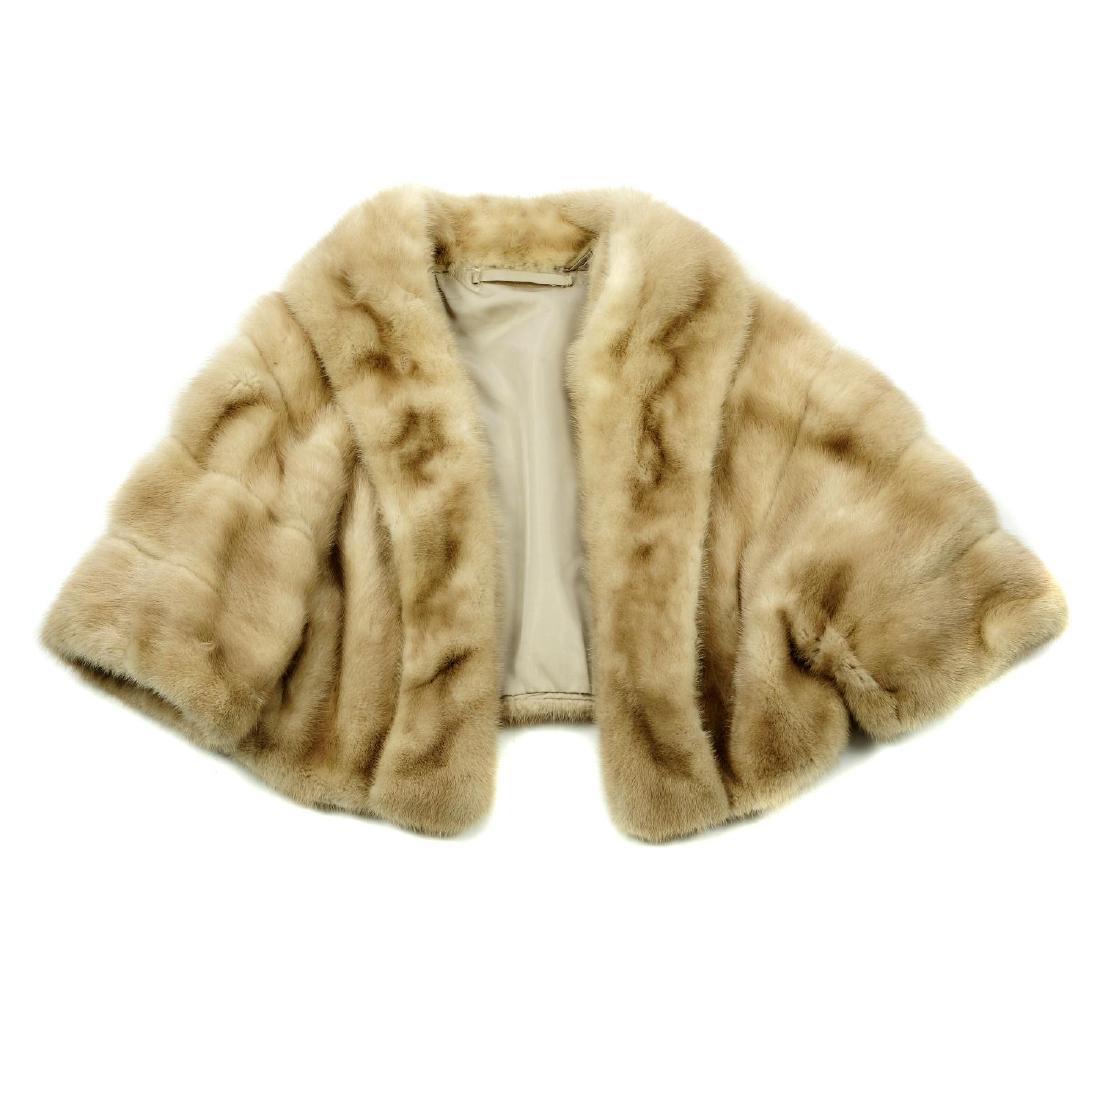 A palomino mink bolero. Featuring a shawl collar, an